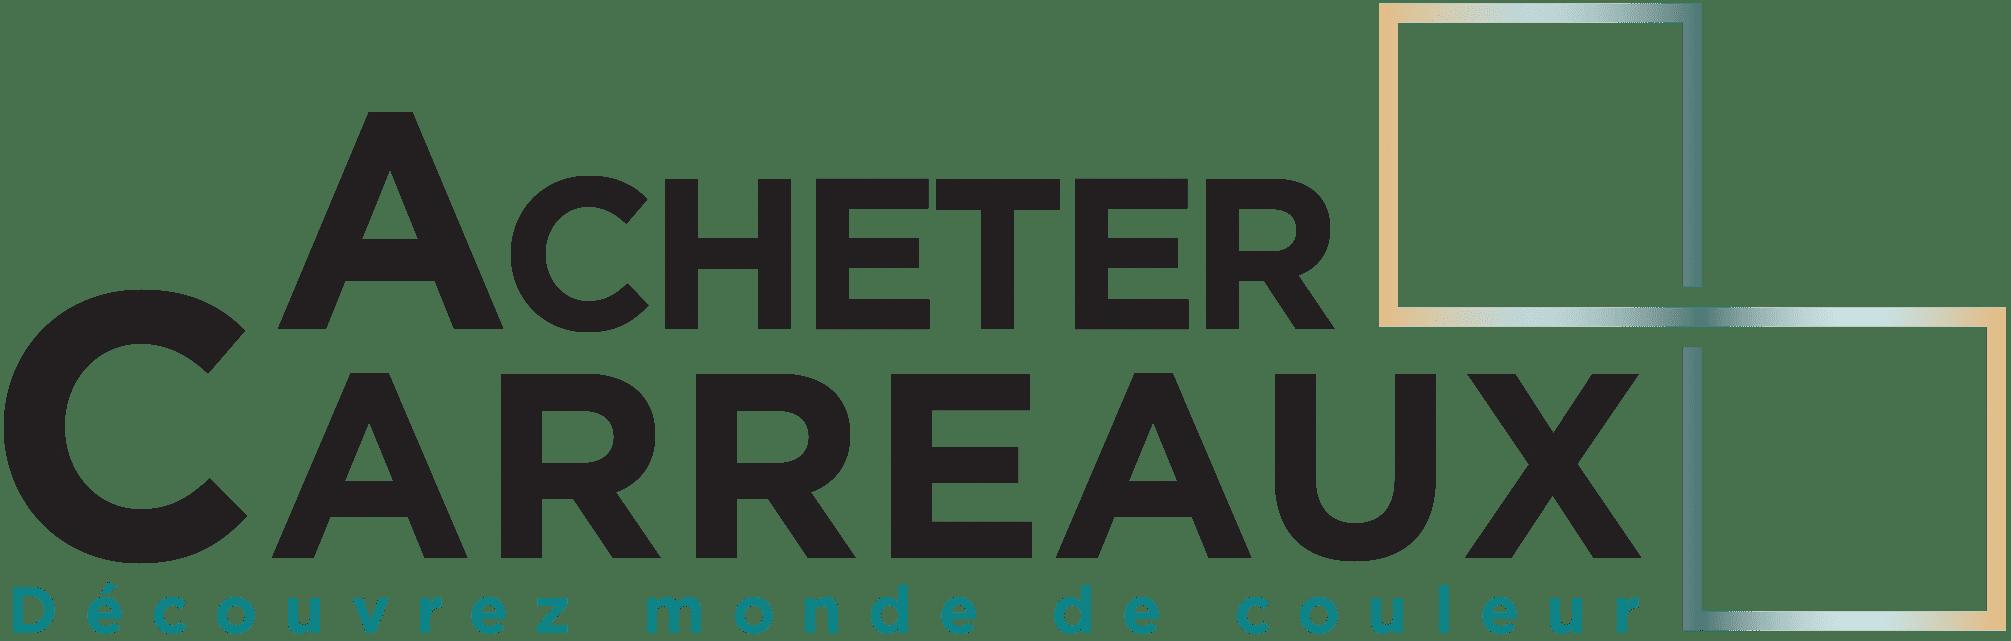 Acheter Carreaux